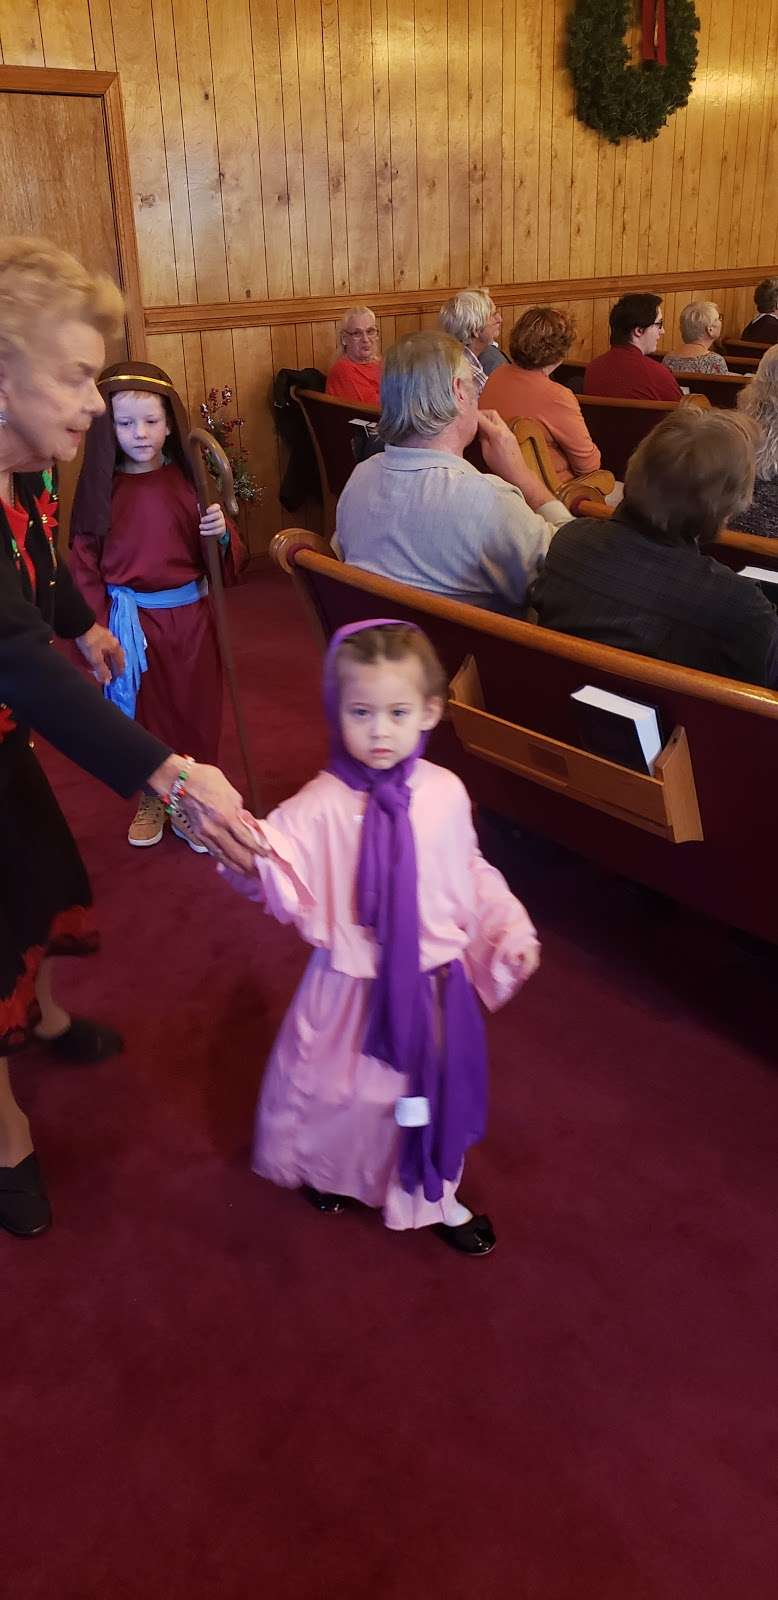 Crisfield Wesleyan Church - church    Photo 1 of 1   Address: 3065 Lawsonia Rd, Crisfield, MD 21817, USA   Phone: (410) 968-0026